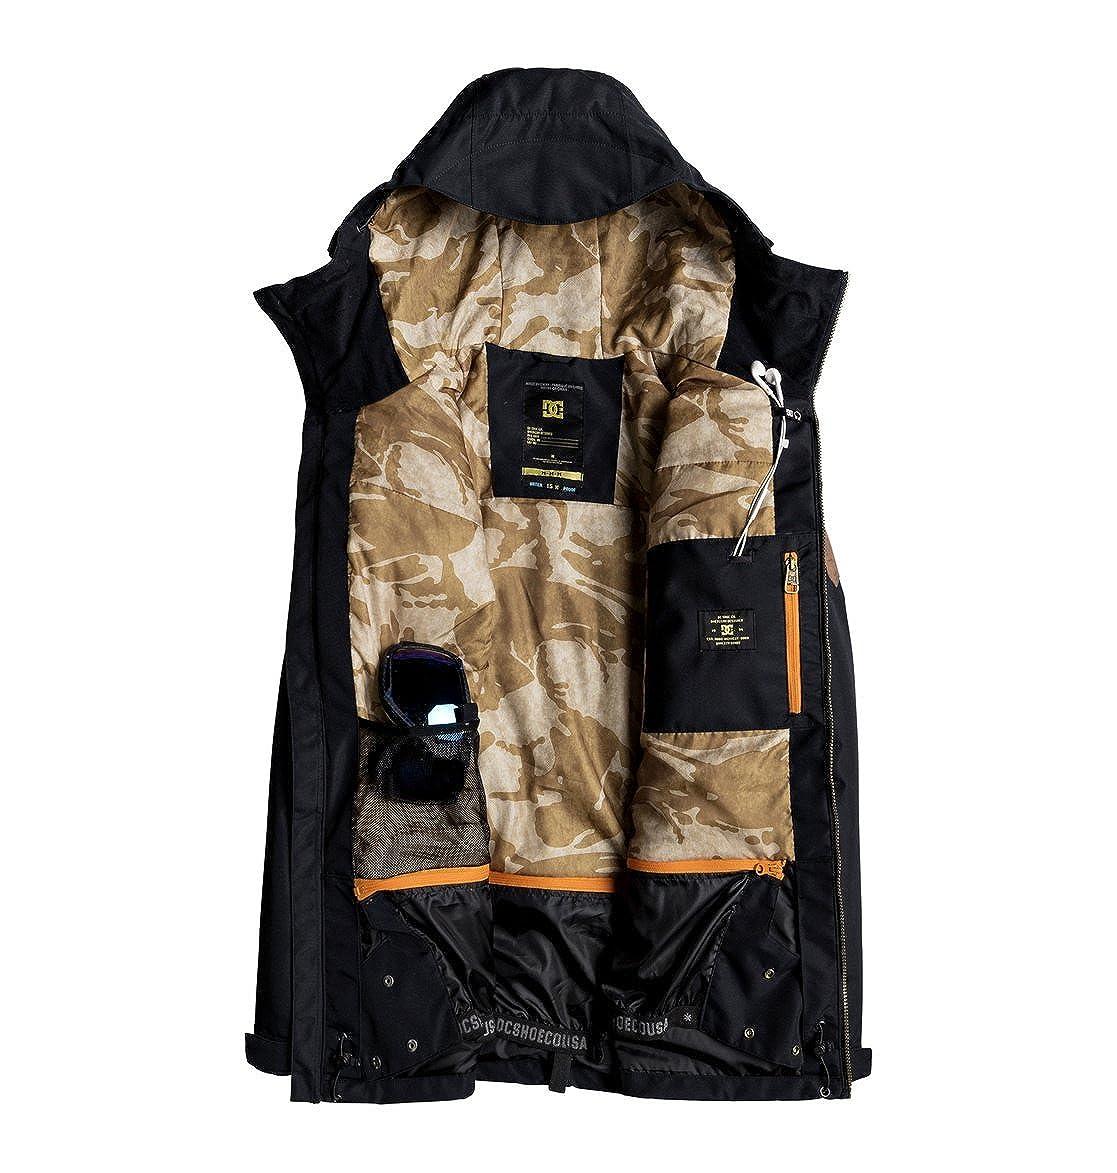 Amazon.com: DC Mens Summit Snowboard Jacket: Clothing